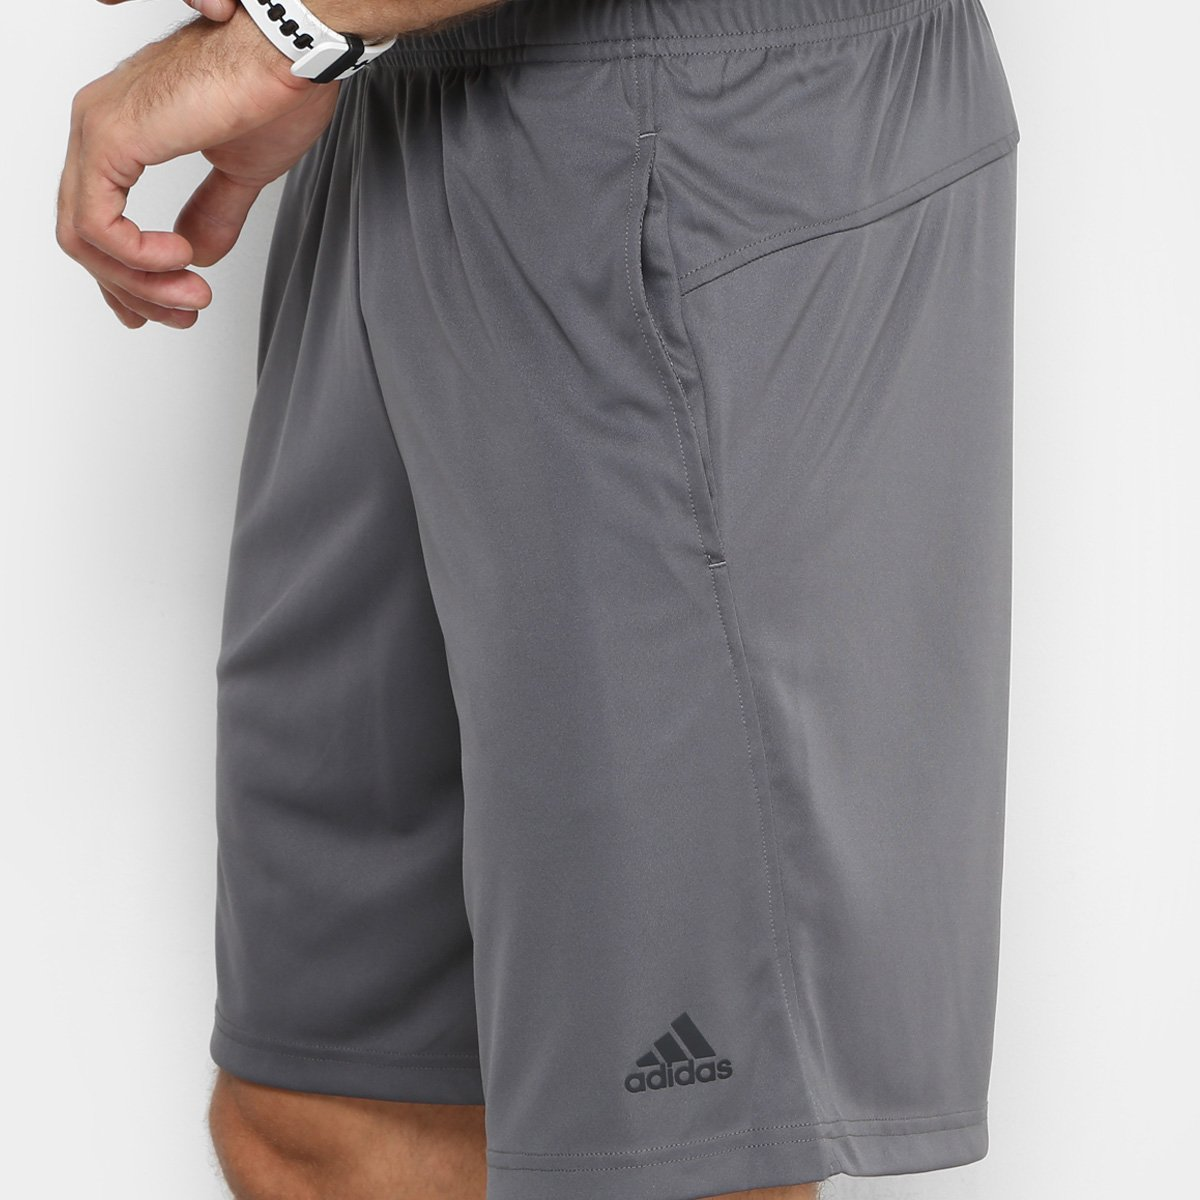 82d45a6f23 Bermuda Adidas Plain Masculina - Cinza e Preto - Compre Agora